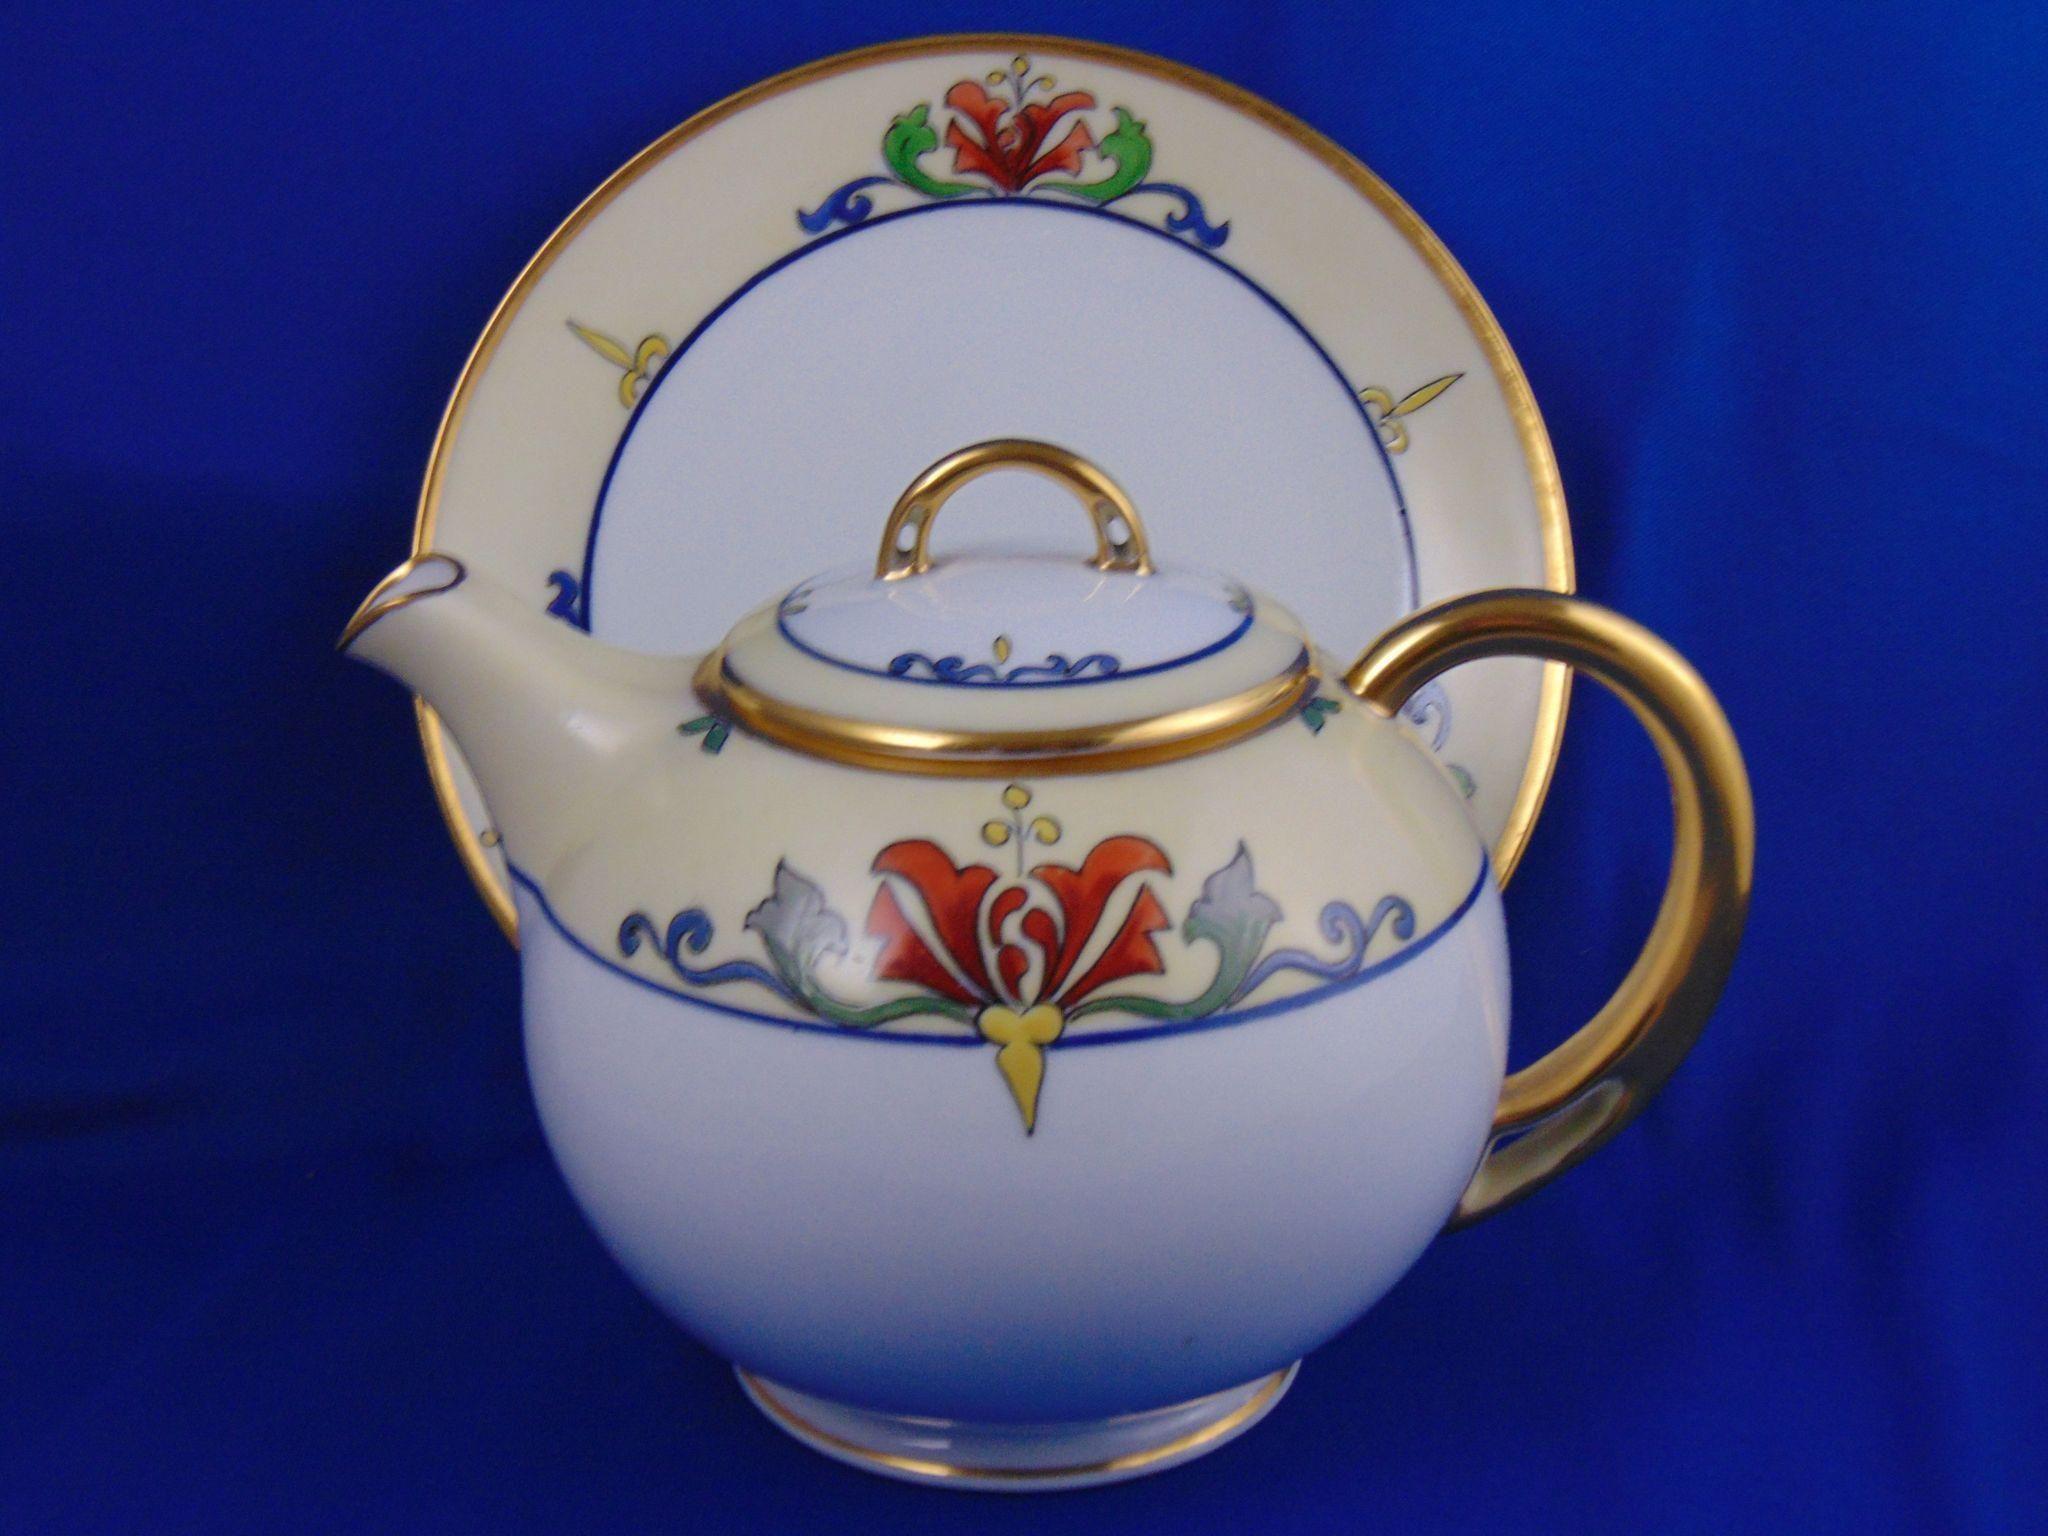 HC Royal Bavaria/Pirkenhammer Julius Brauer Studio Arts & Crafts Teapot/Syrup Pitcher & Plate (c.1914-1923)